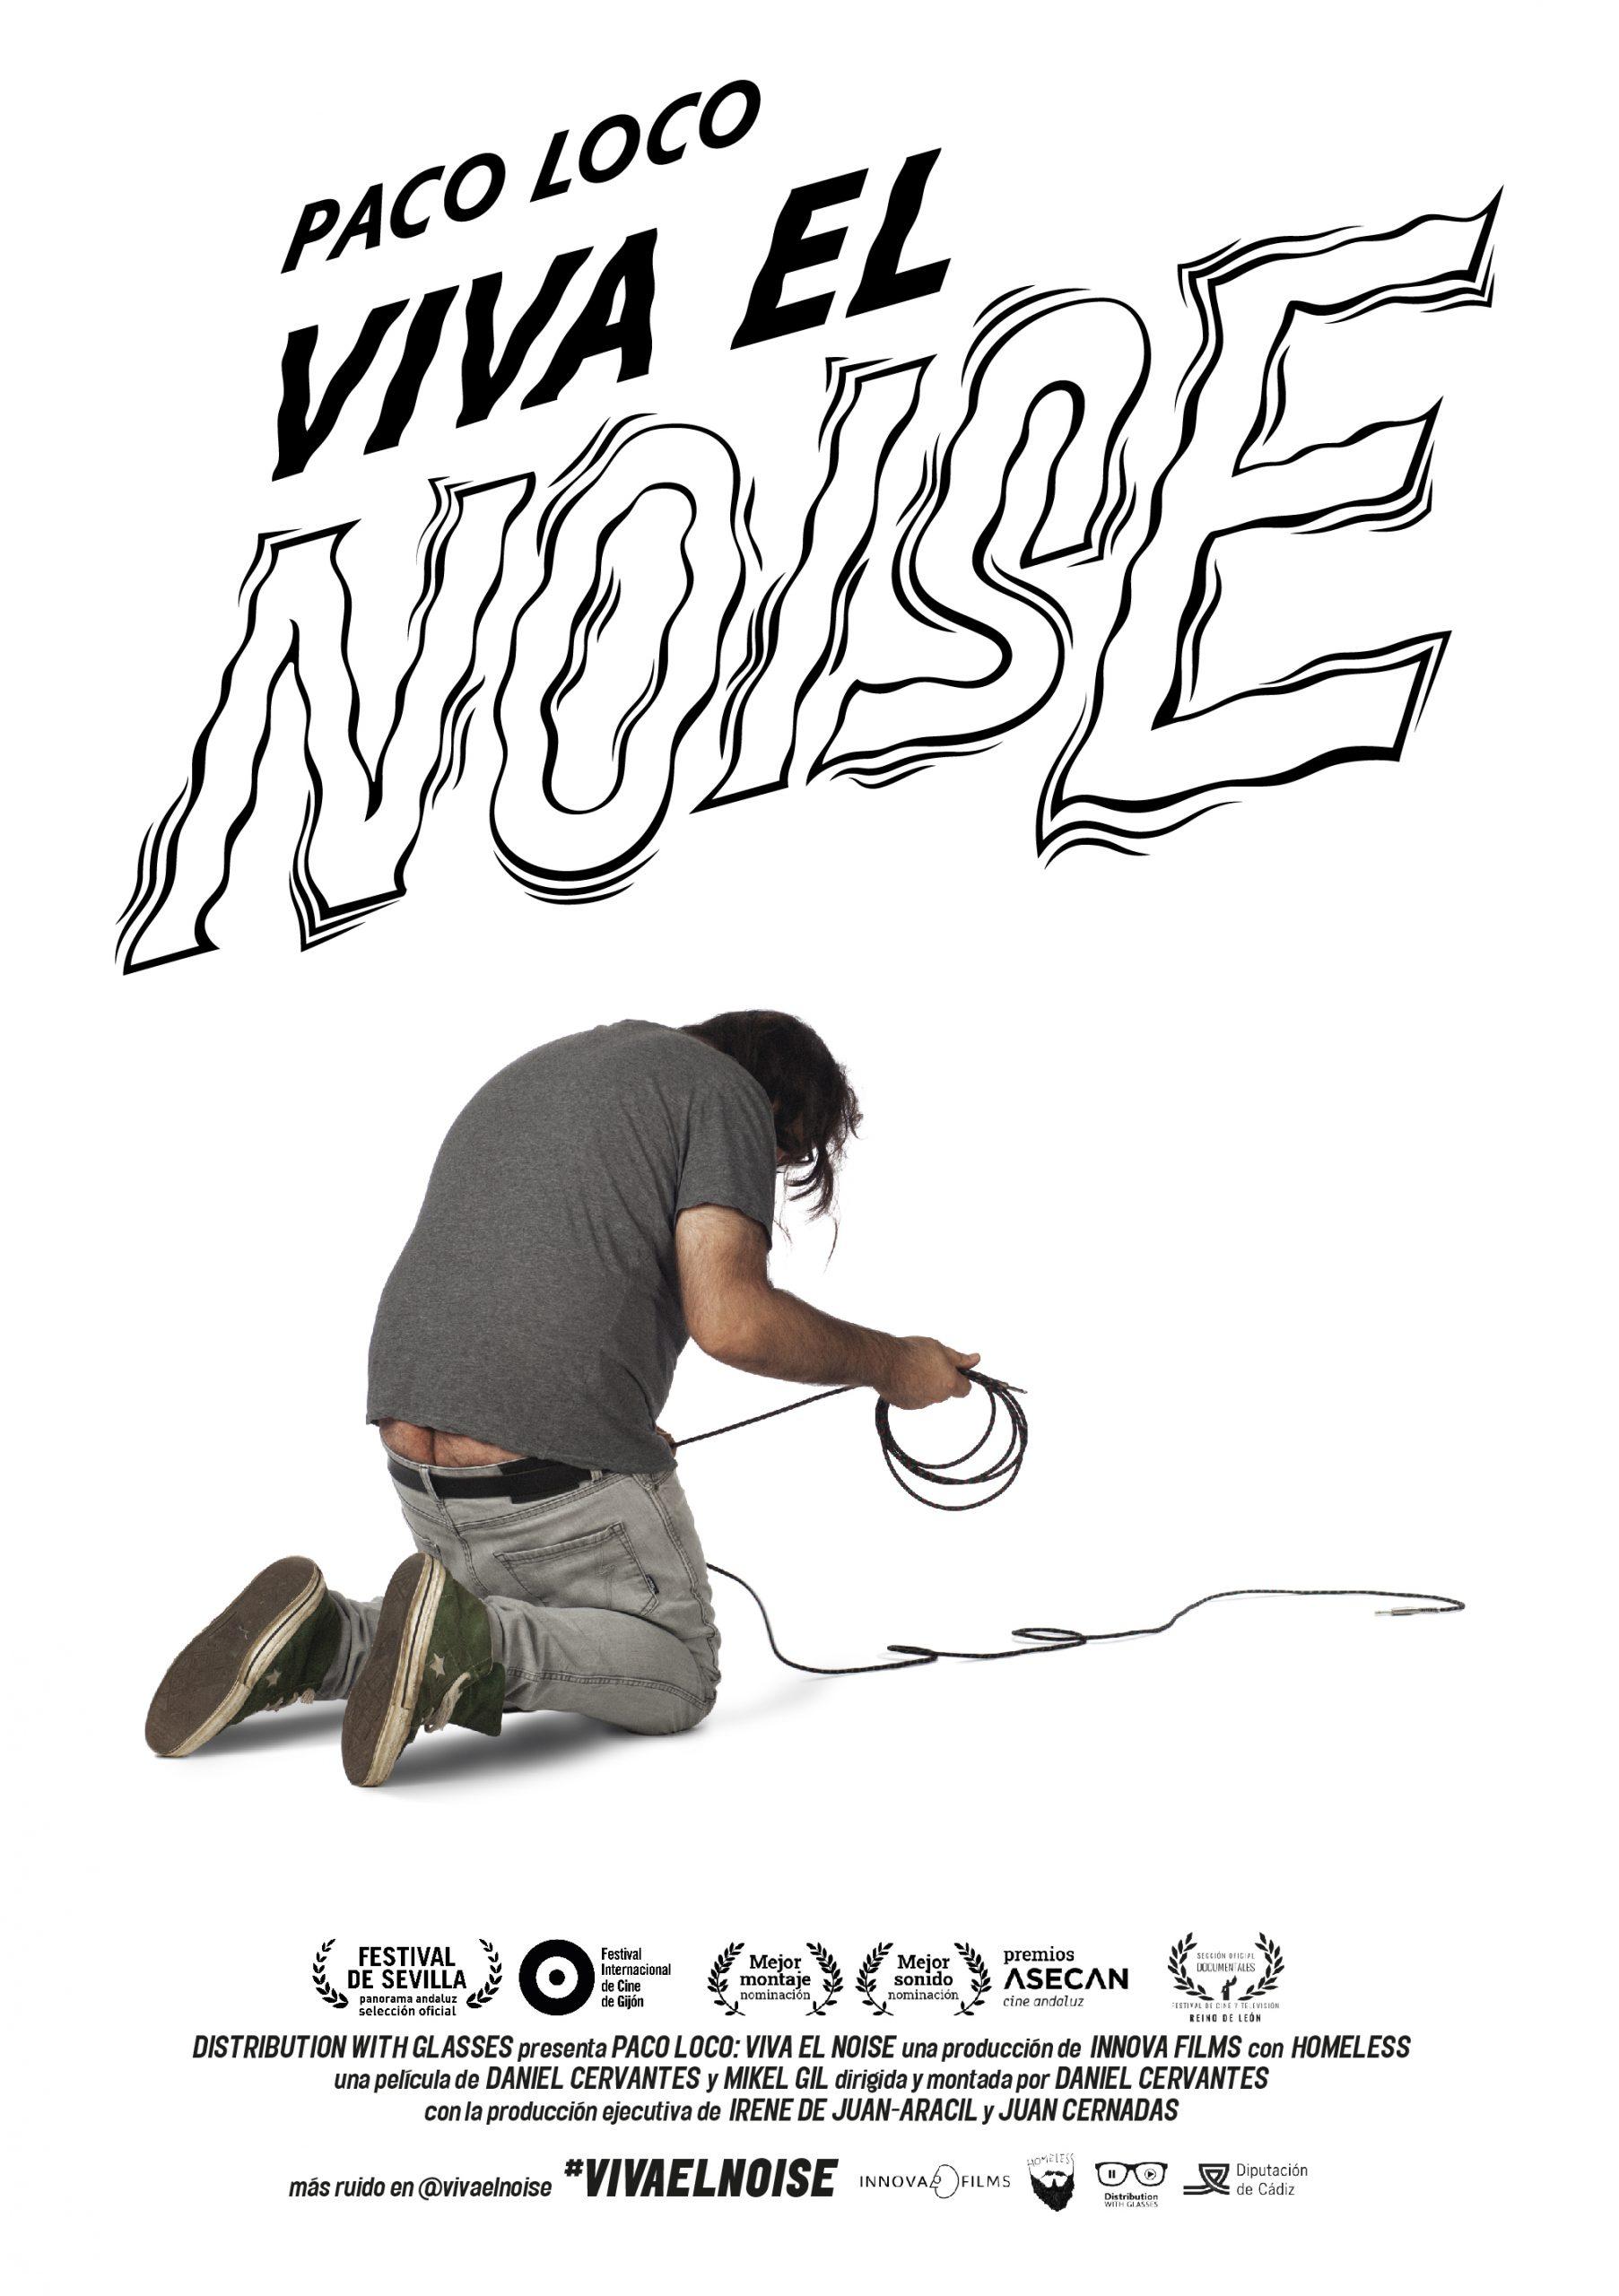 Paco Loco viva el noise